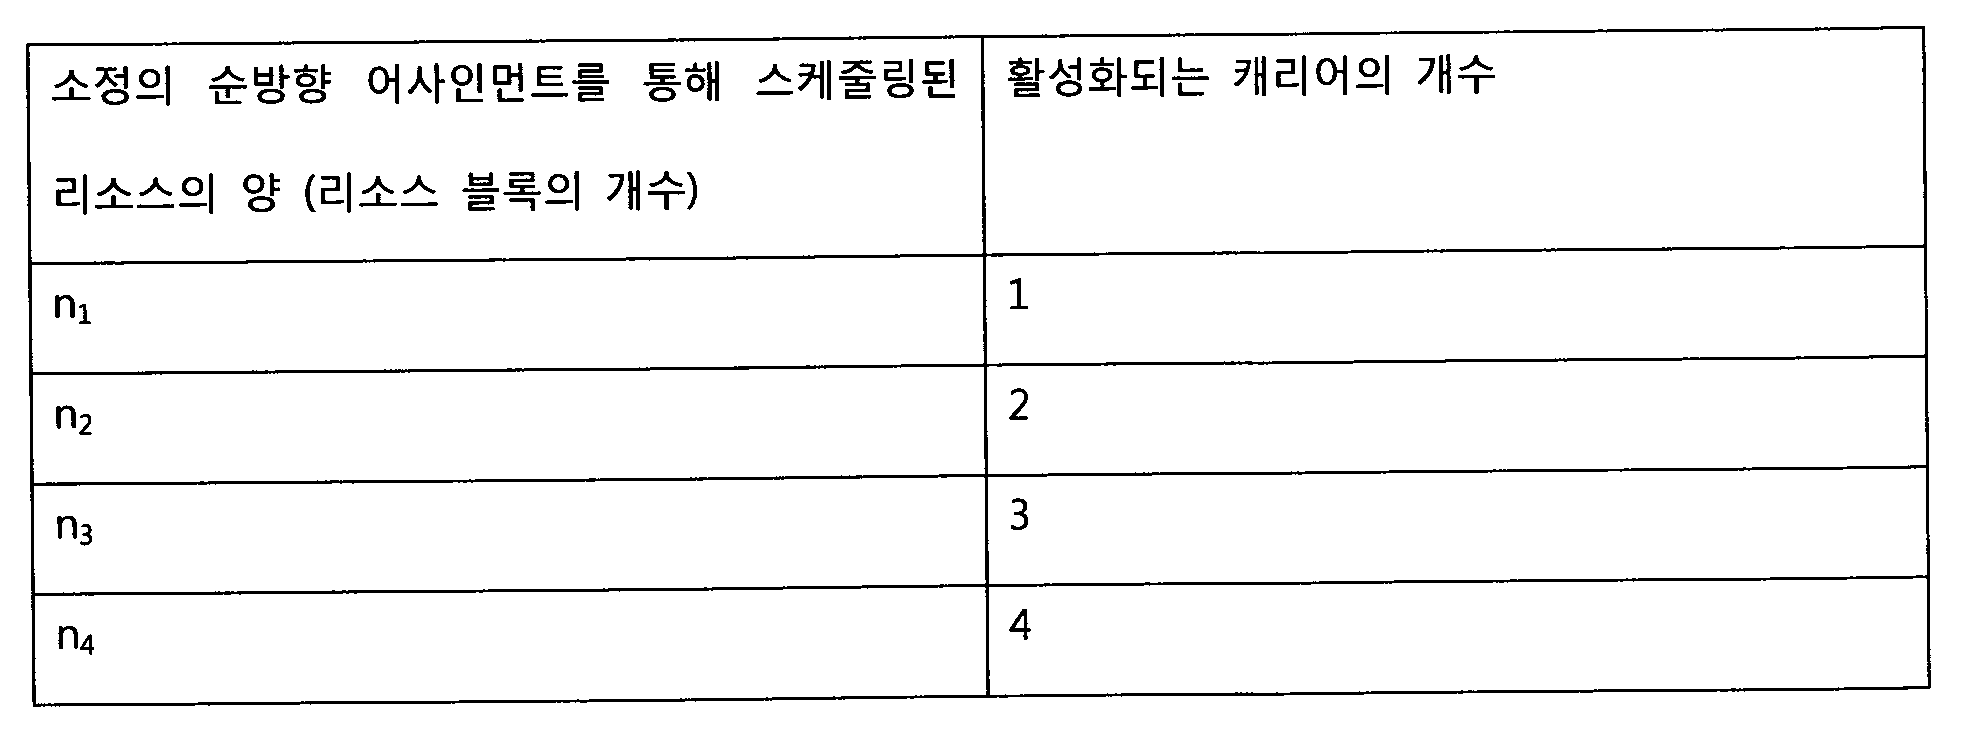 Figure 112010030019233-pat00003